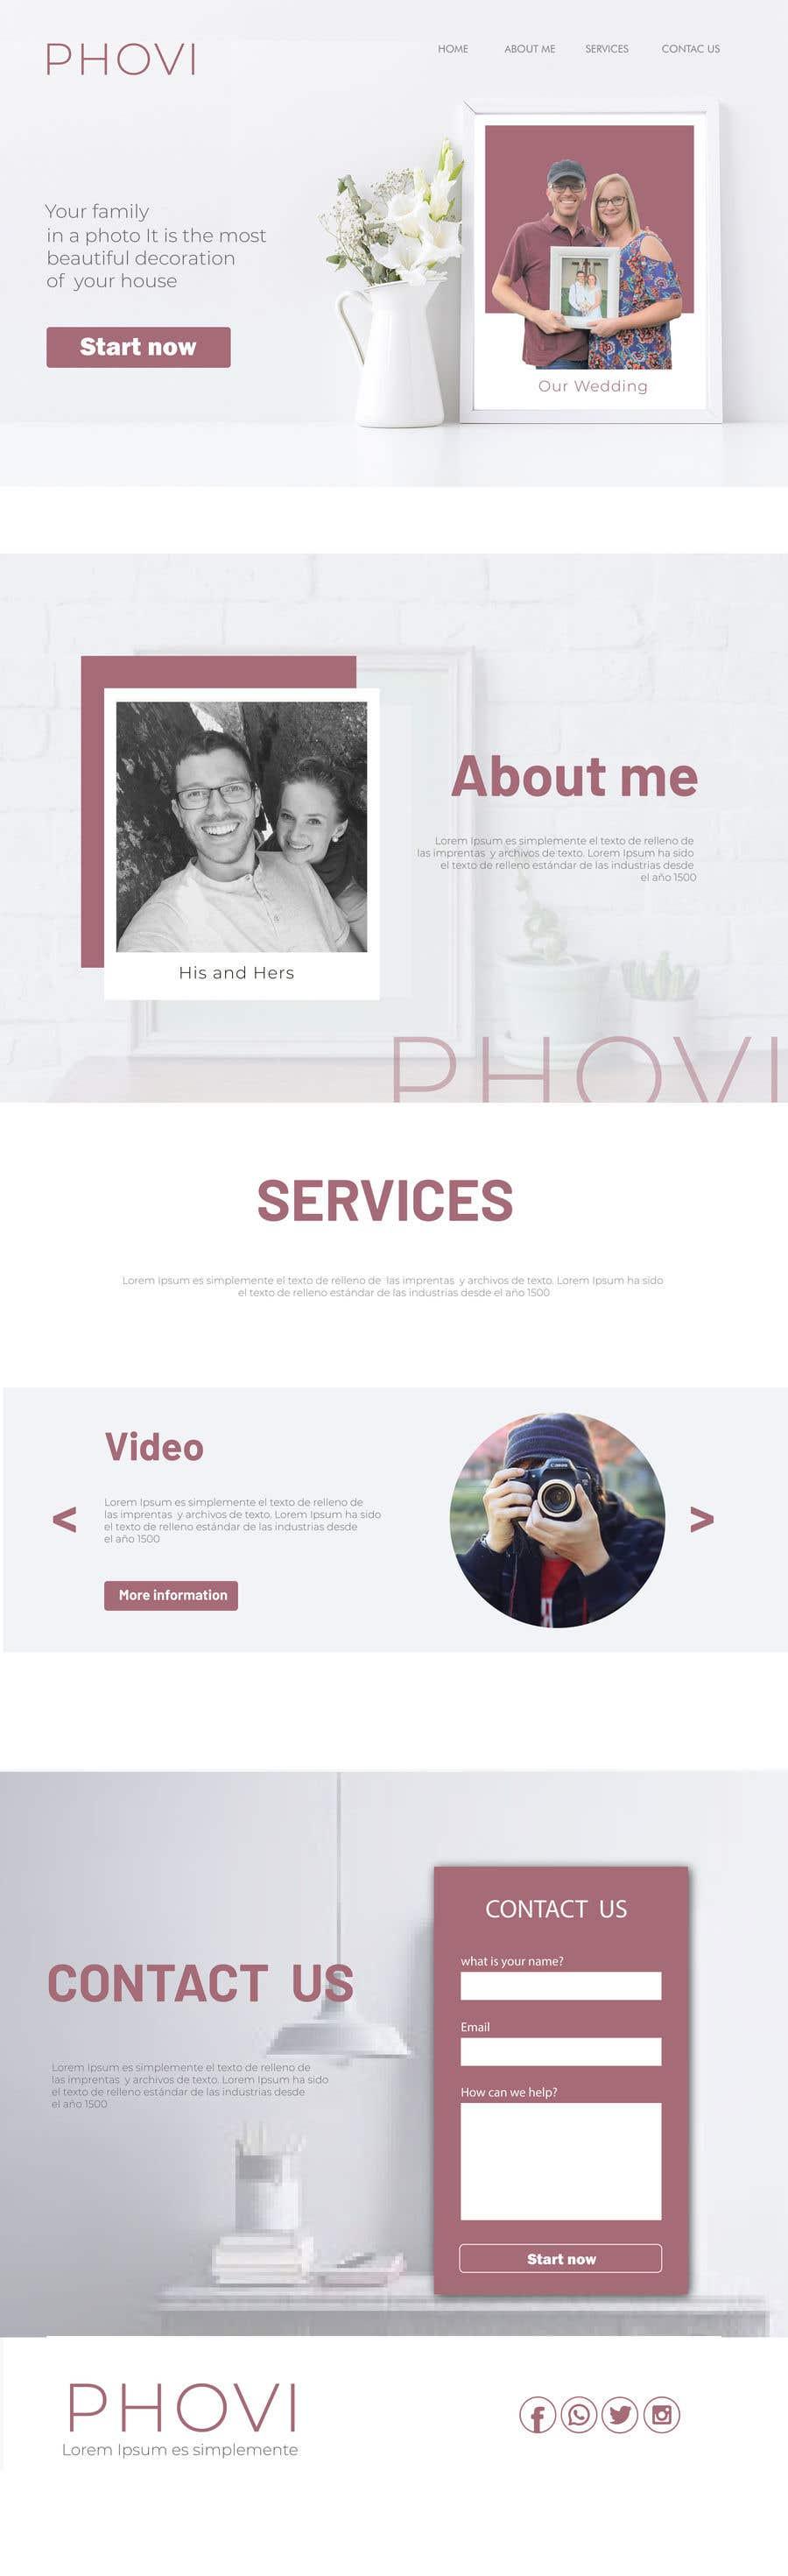 Kilpailutyö #38 kilpailussa Design Clean, Minimalist, Professional Website Layout and Logo